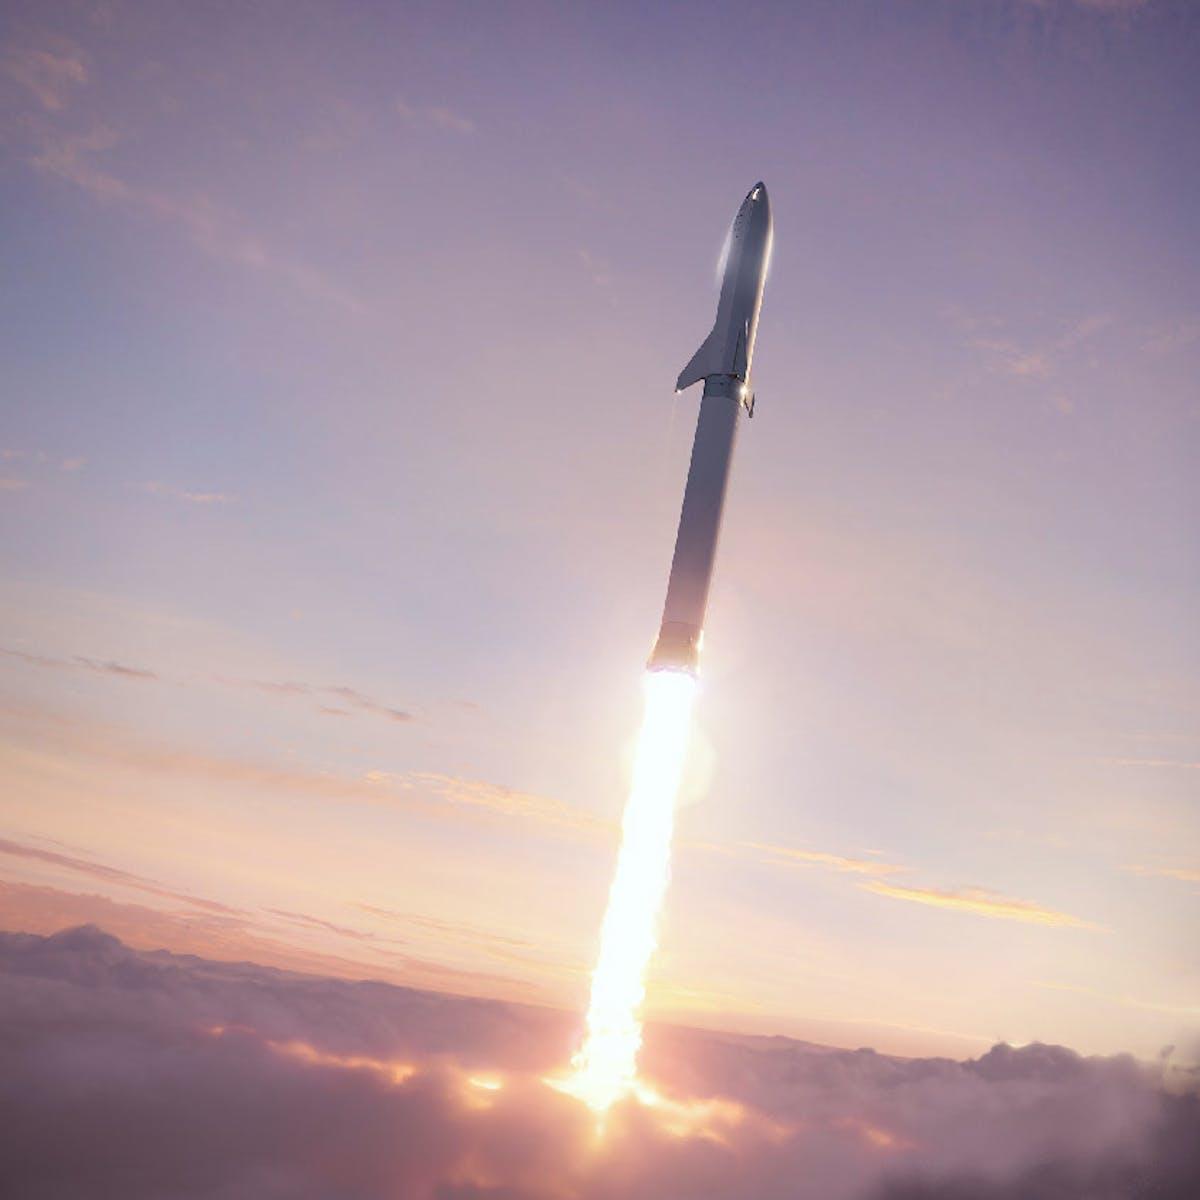 SpaceX: How Elon Musk wants to reach zero-carbon rocket flights